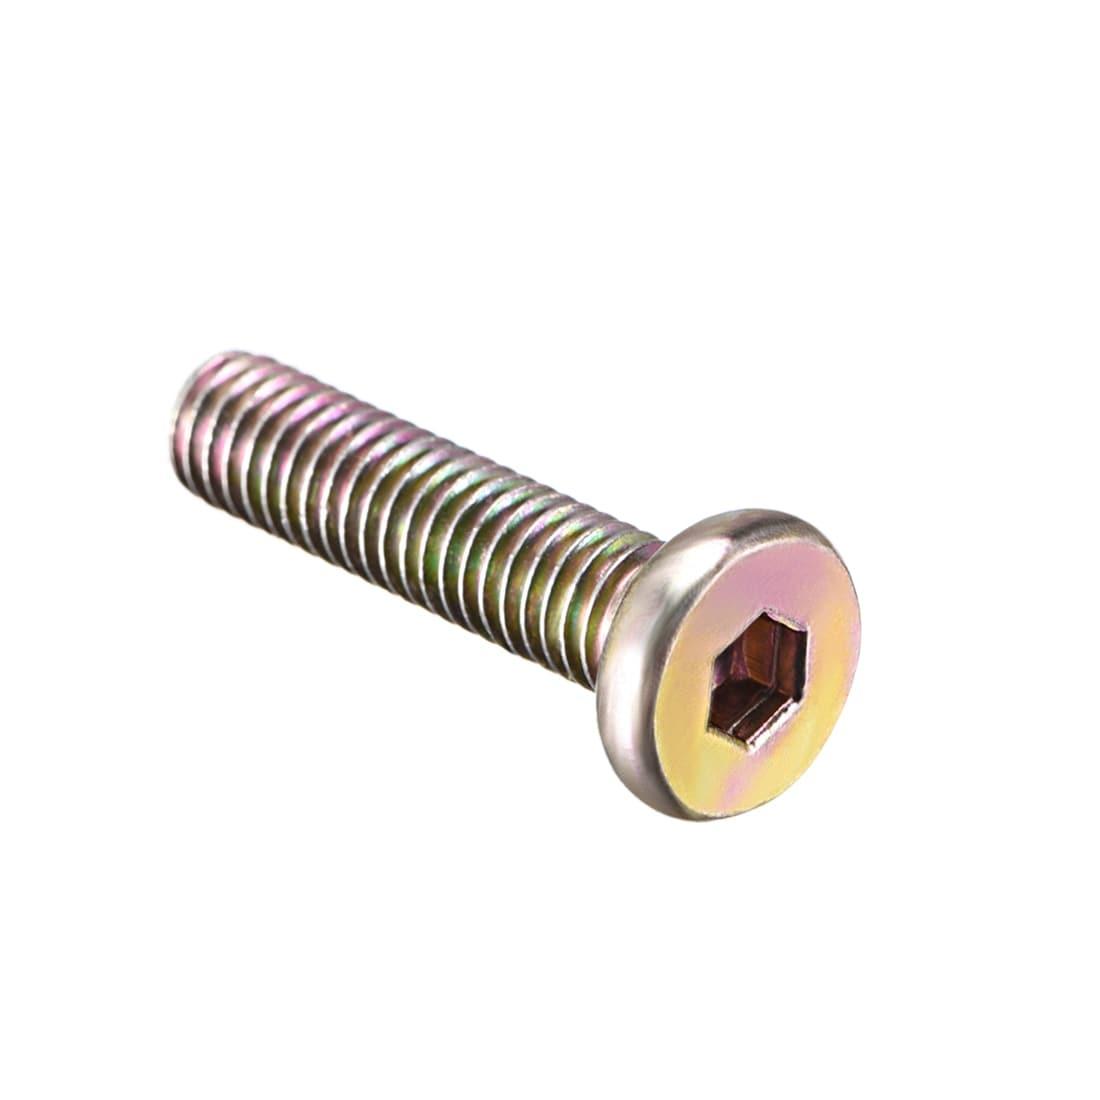 Details about  /100pcs M6 x 25mm Furniture Screw-in Nut Bolt Fastener Hex Socket Insert Nuts